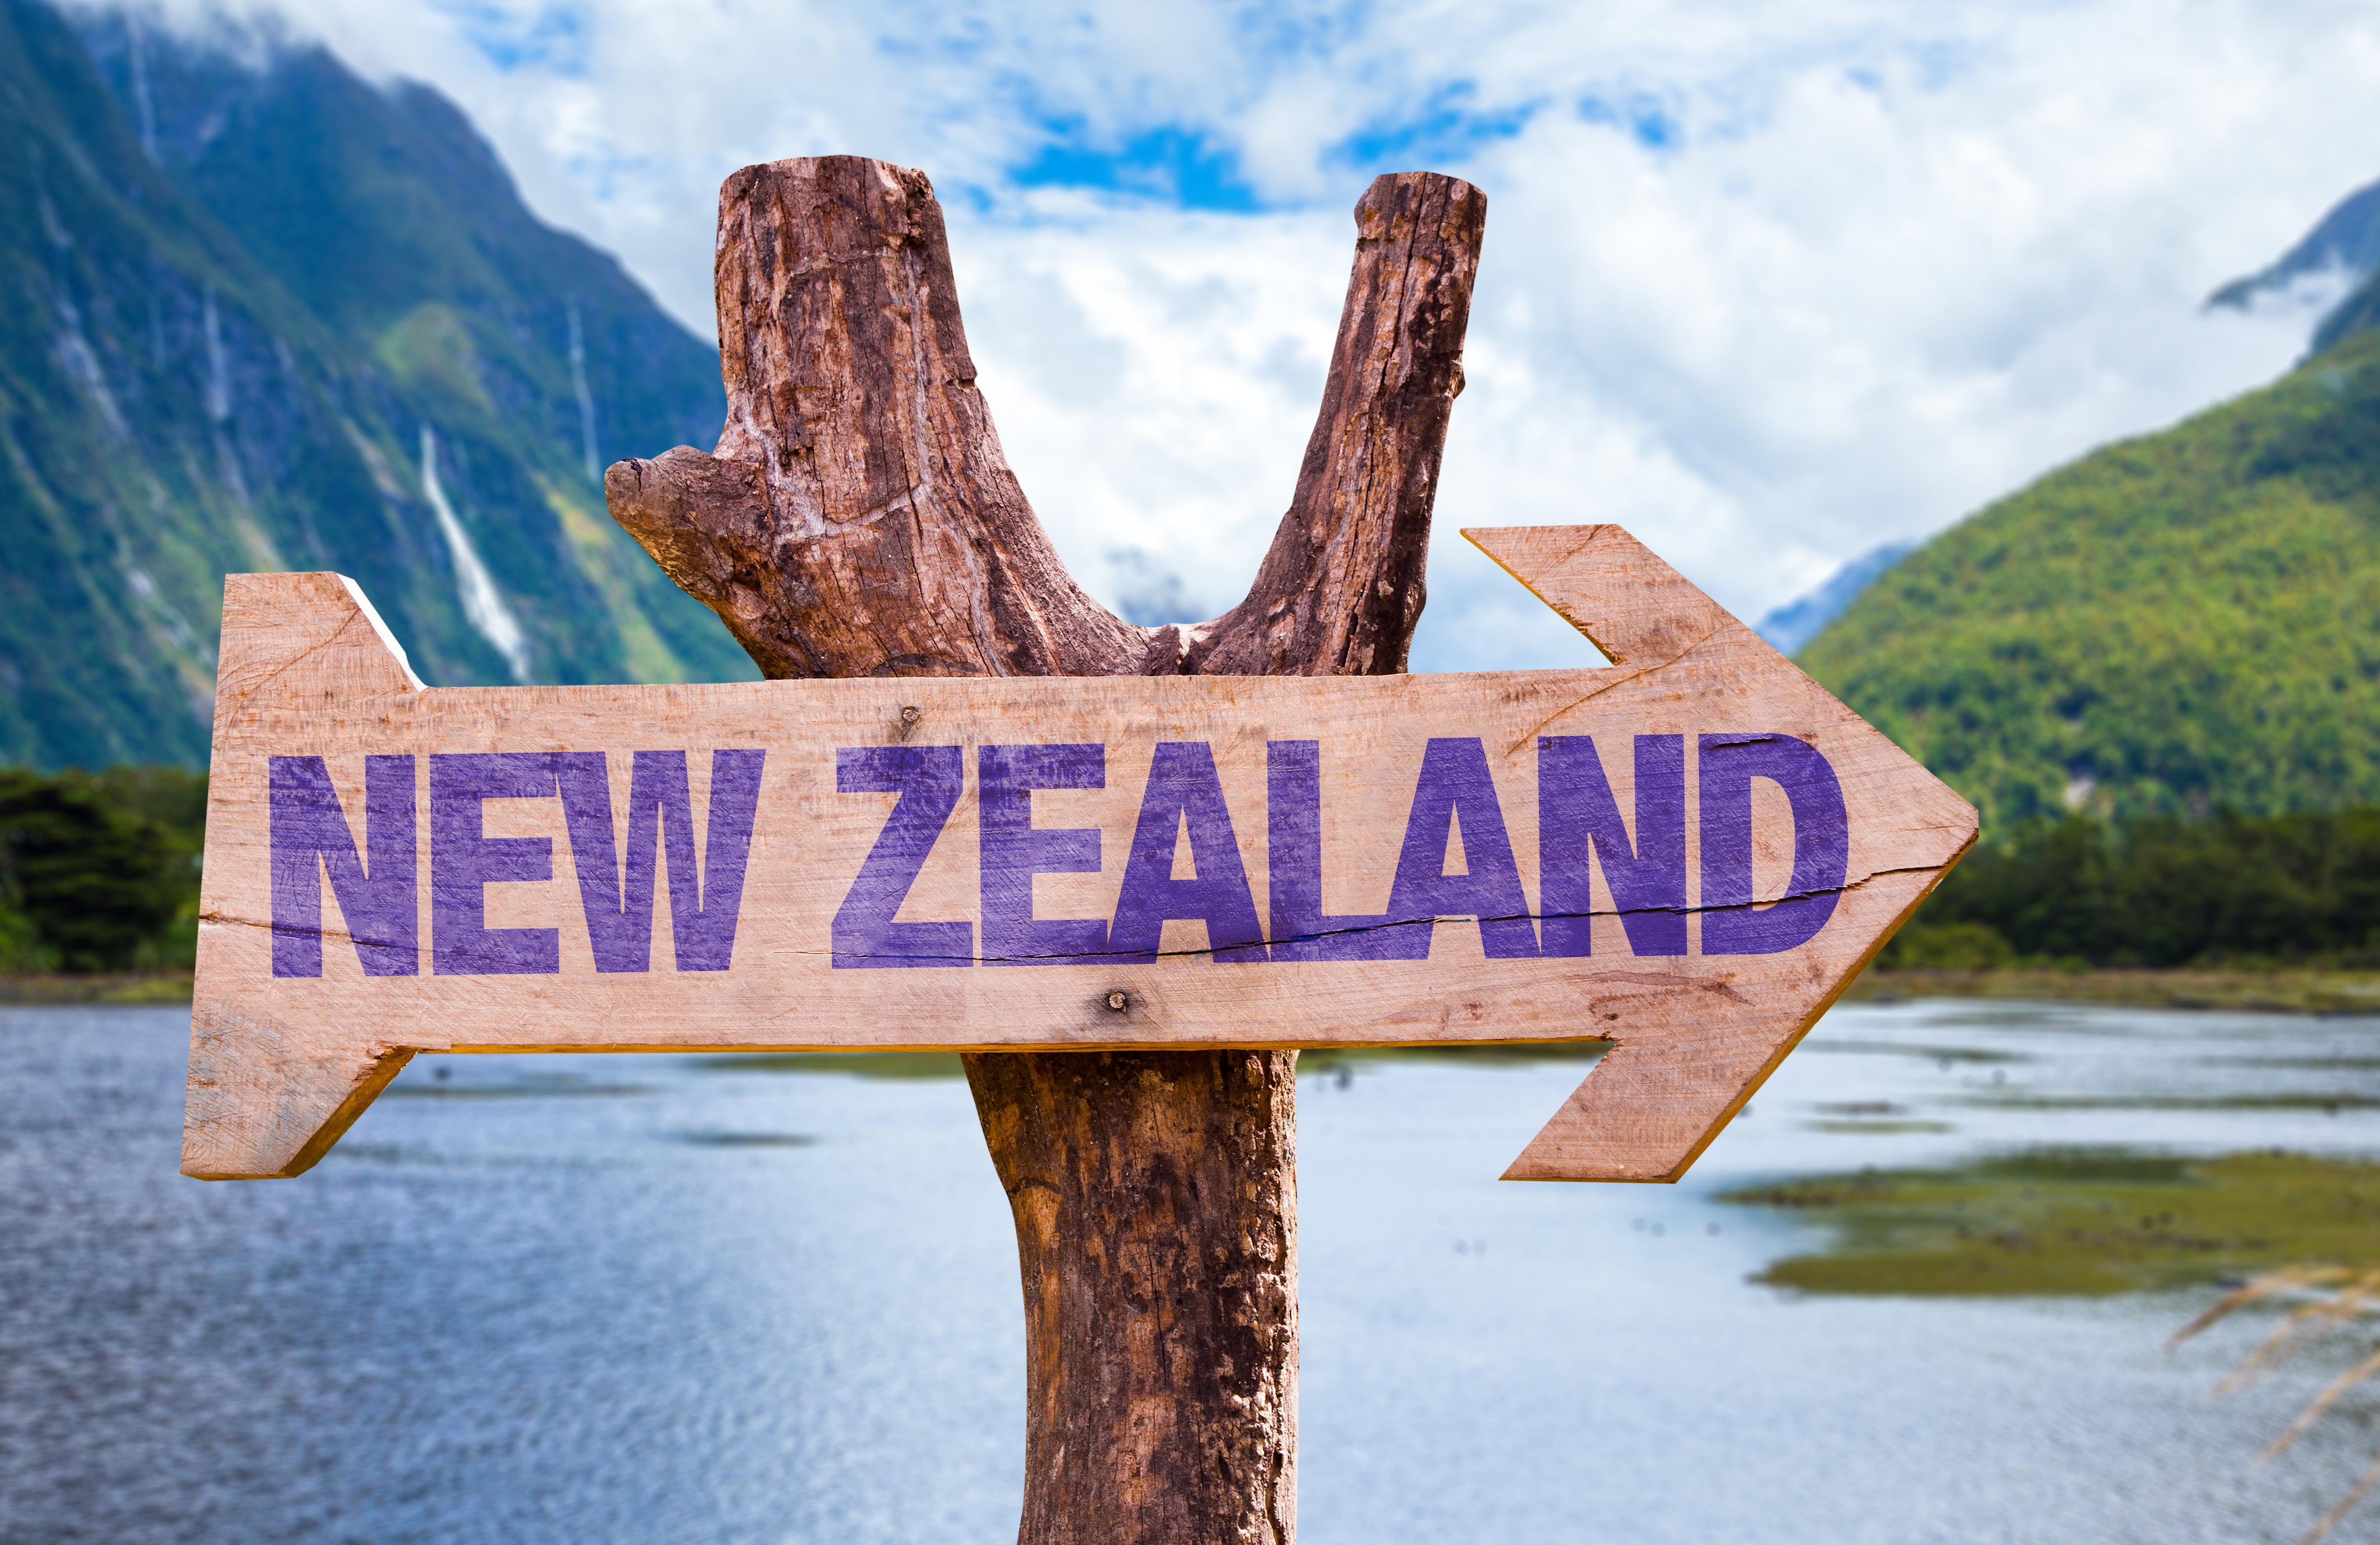 best New Zealand honeymoon, best destination honeymoon, romantic travel New Zealand, honeymoon travel ideas, unique honeymoon locations, top honeymoon hotspots, top honeymoon New Zealand, Bliss Honeymoons review, best honeymoon travel agent